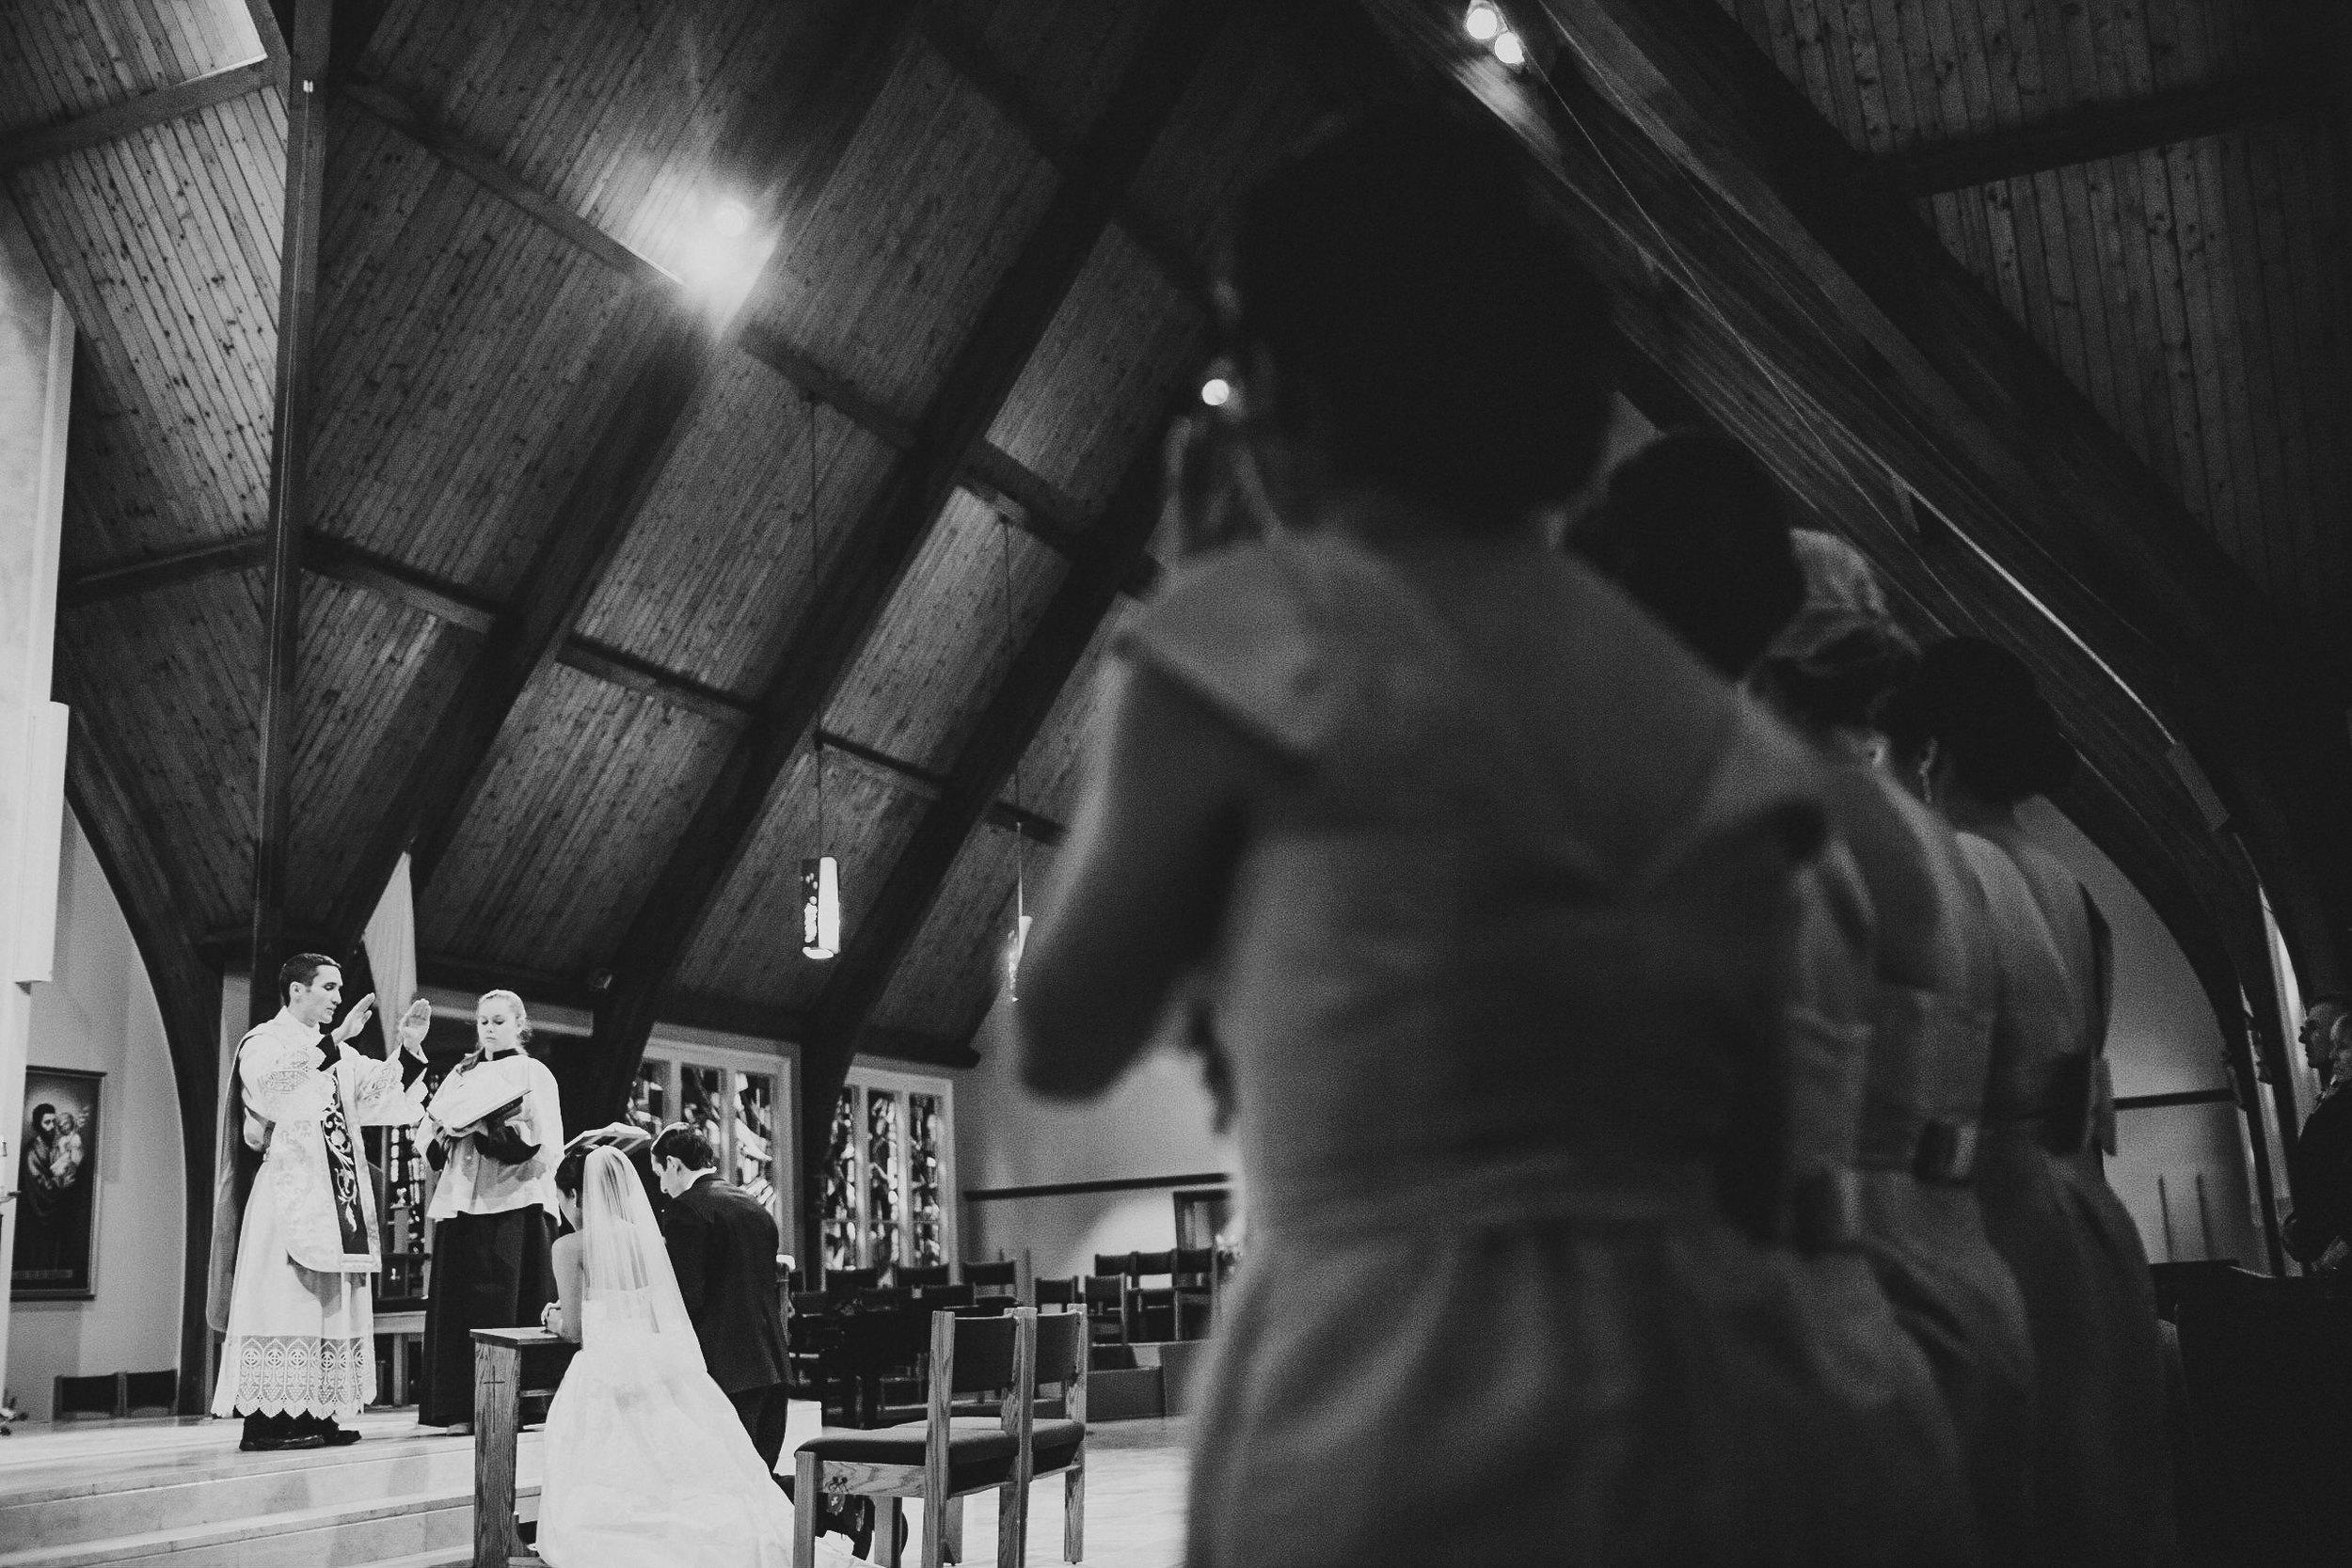 Wedding at Woodlawn Manor Sandy Spring Maryland by Mantas Kubilinskas-15.jpg